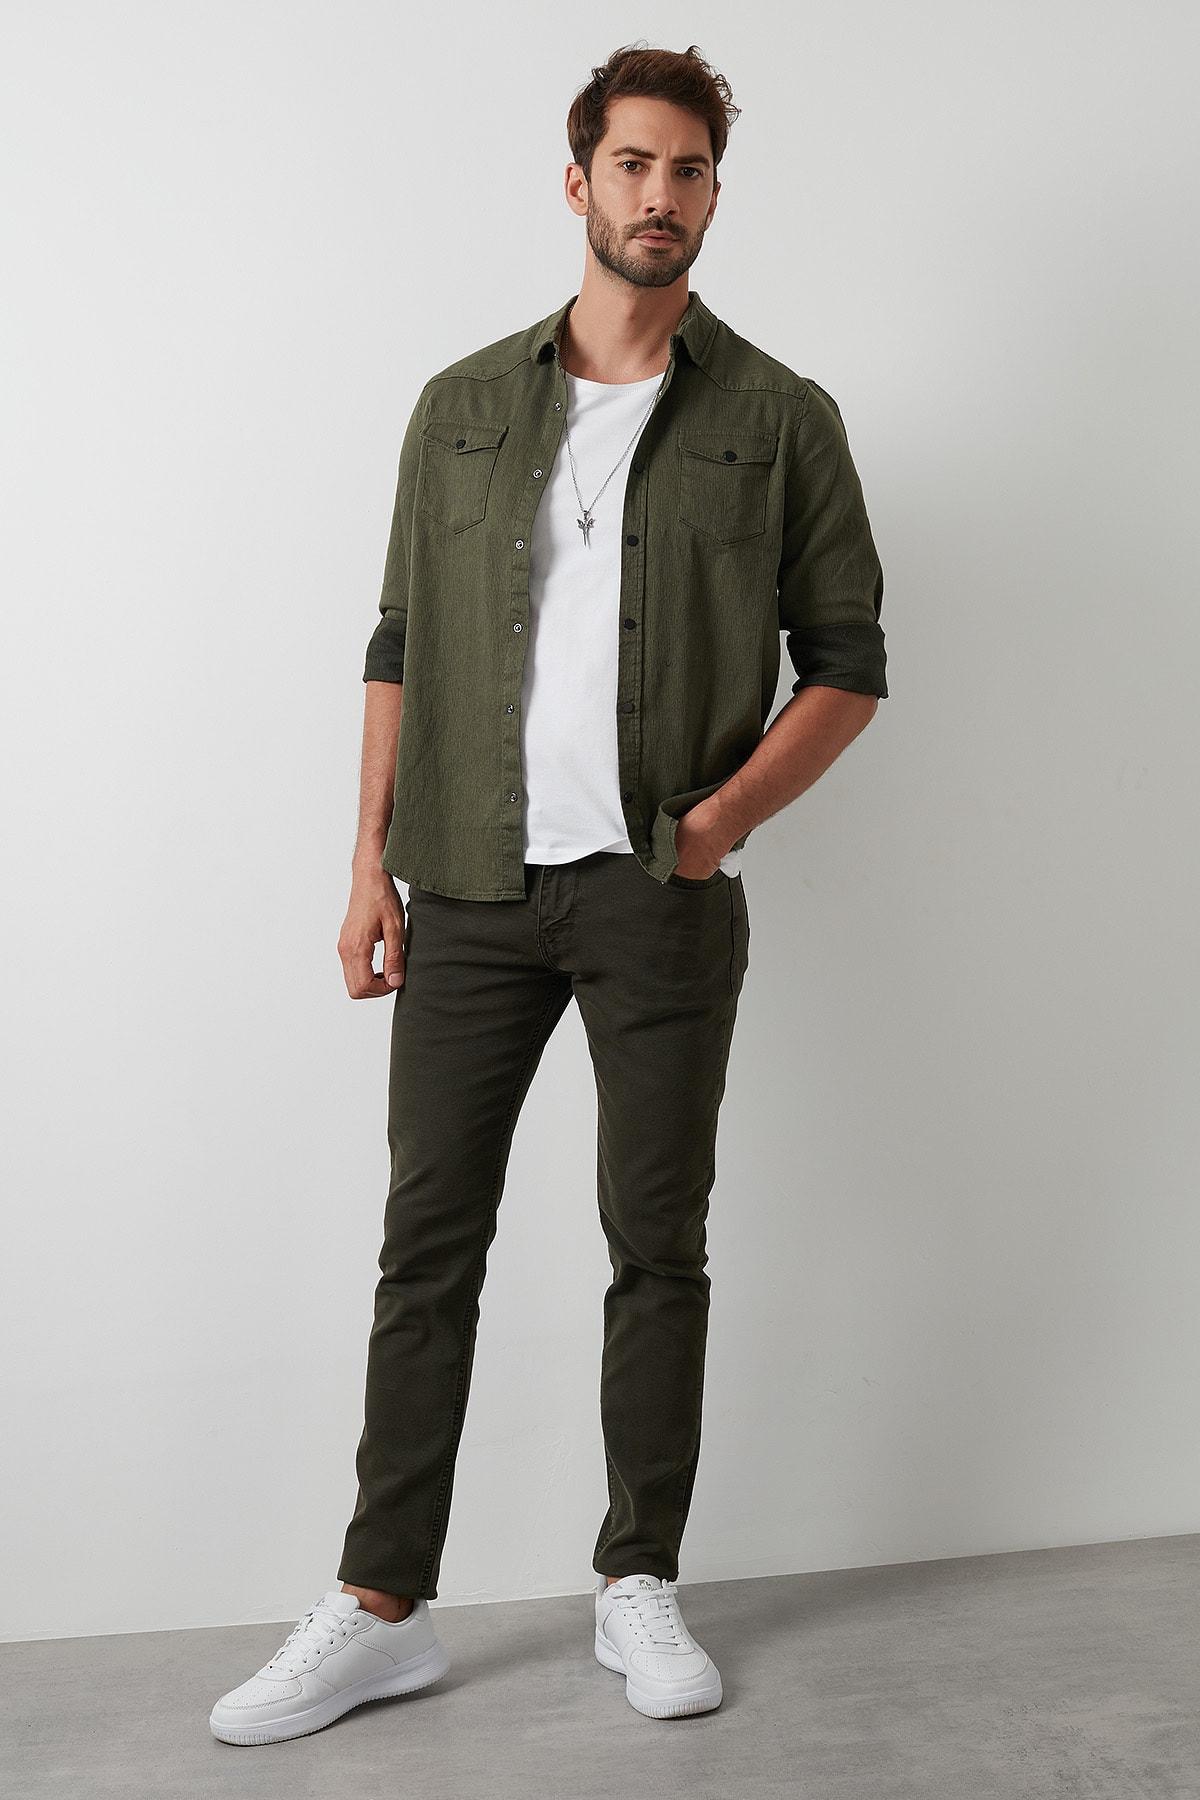 Buratti Erkek Haki 7267f4132zagor Regular Fit Pamuklu Jeans Kot Pantolon 4